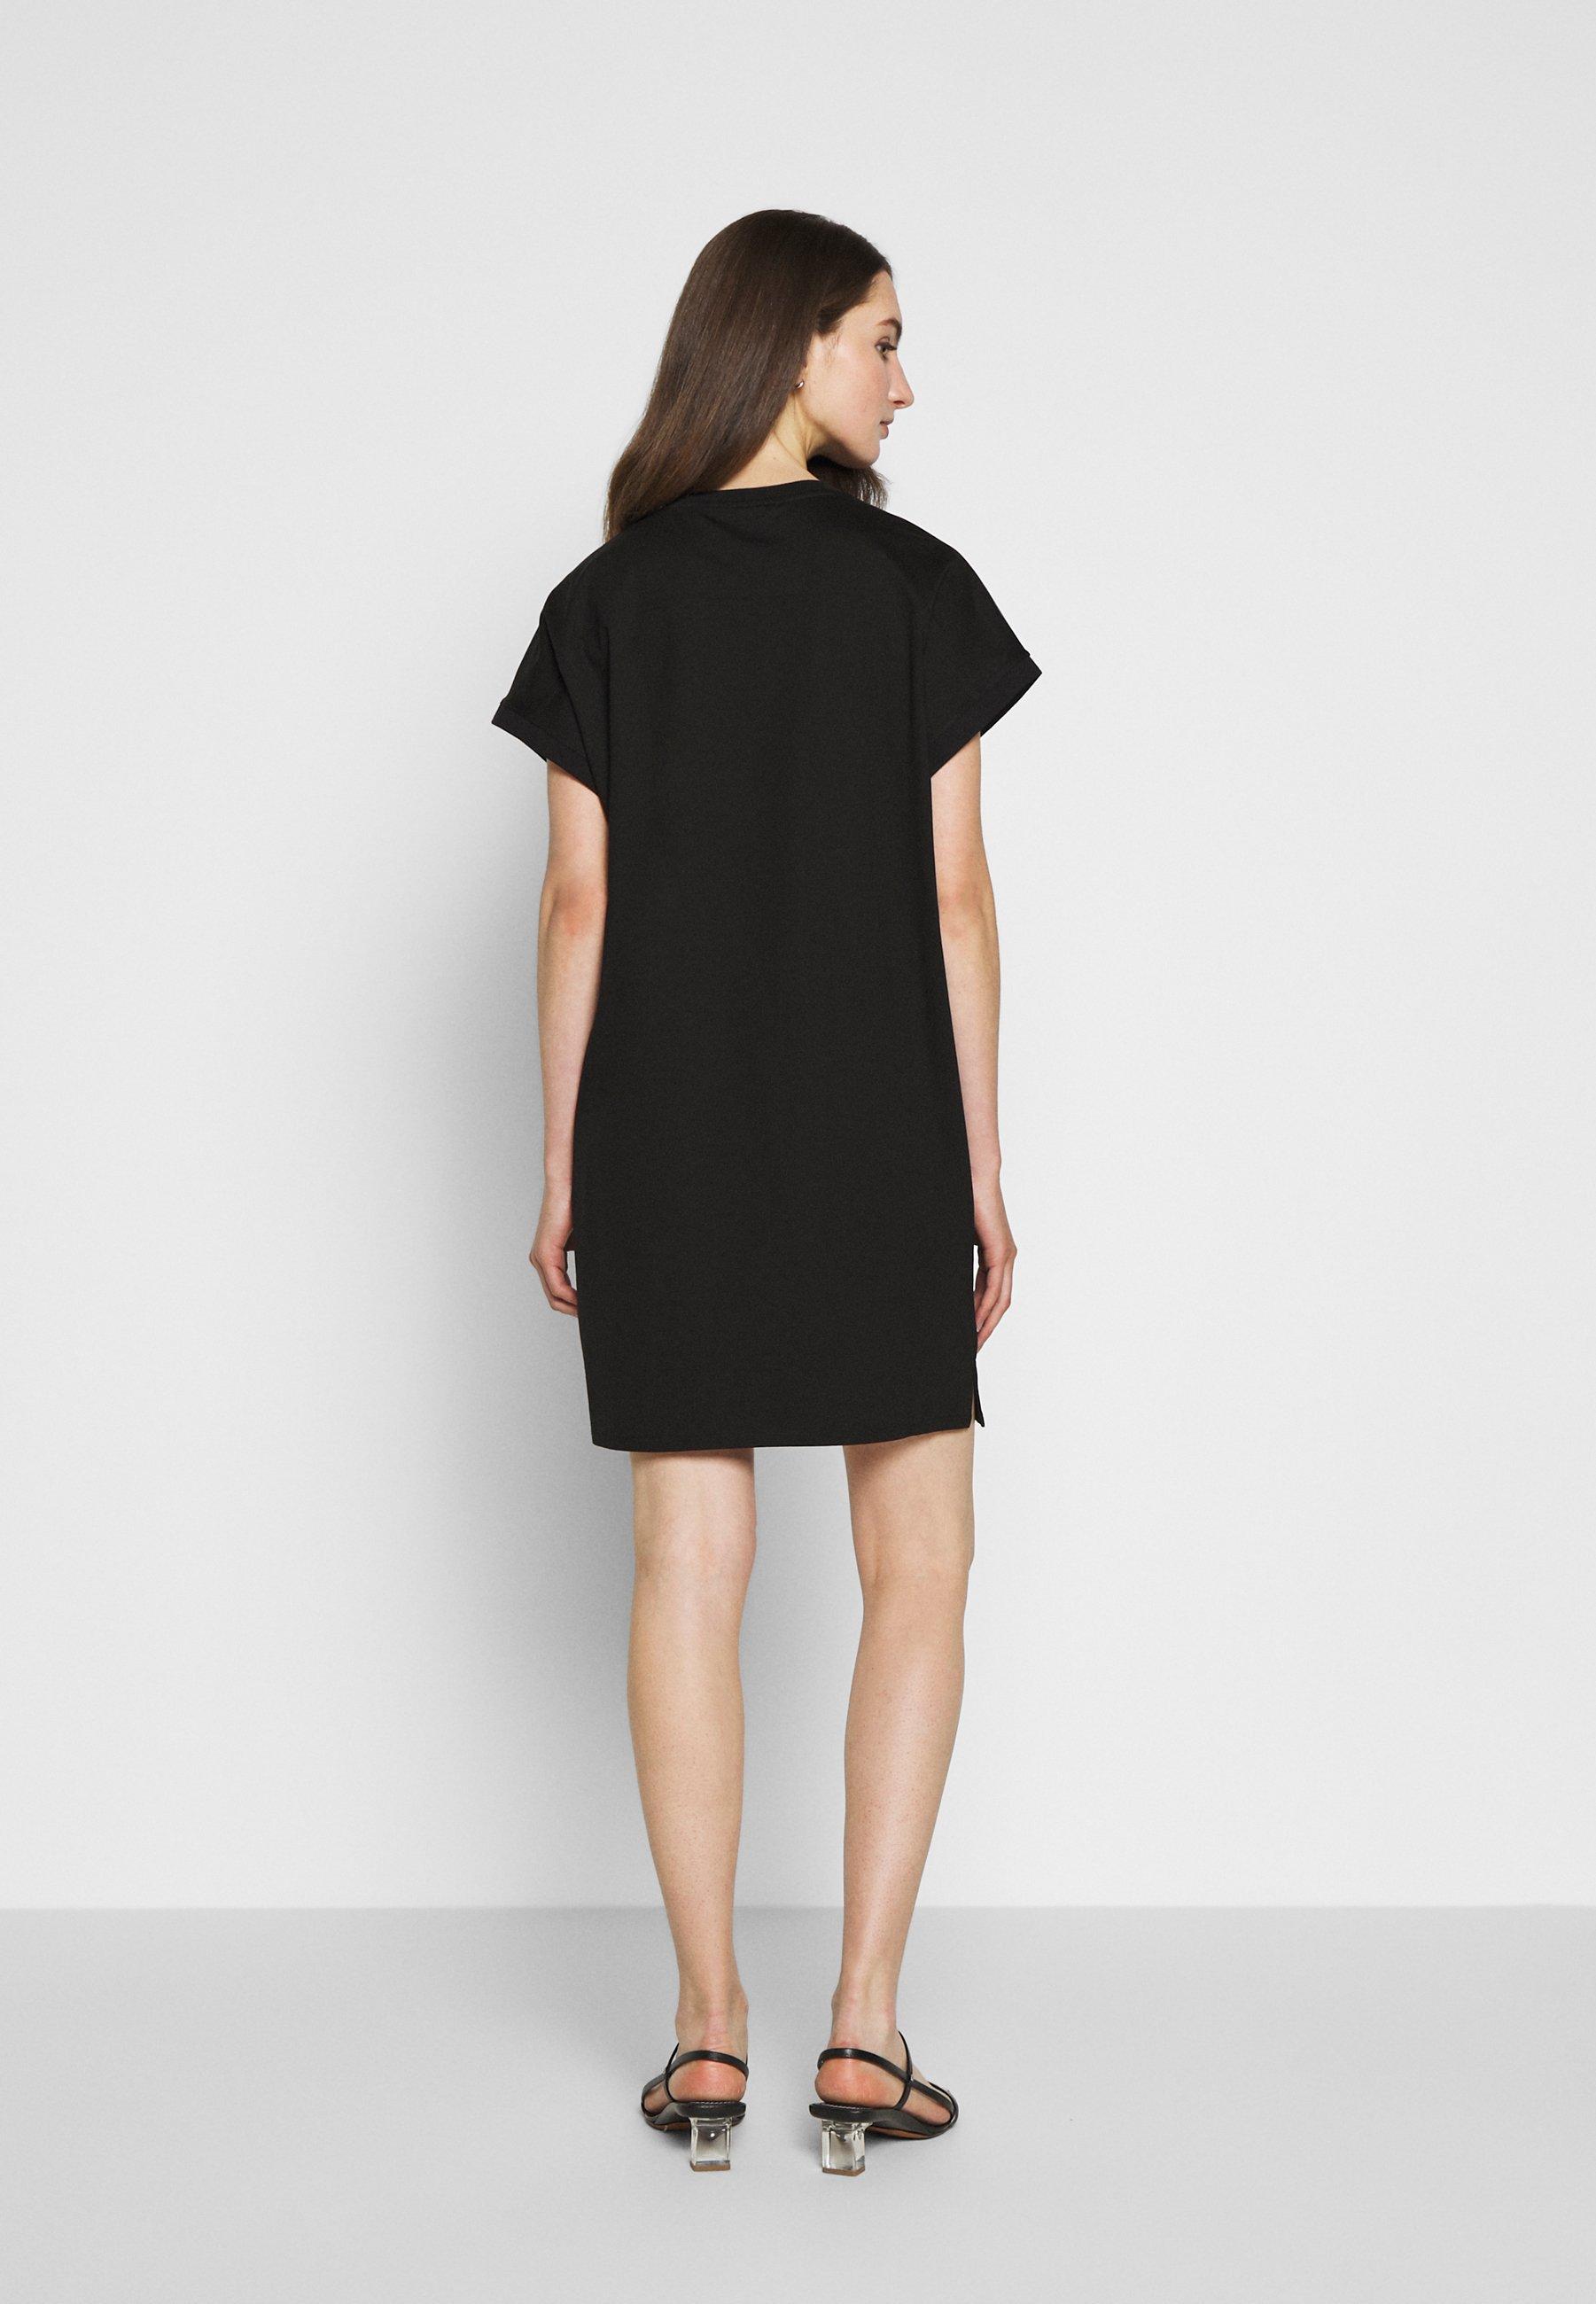 KARL LAGERFELD MERCERIZED DRESS  Jerseykleid black/schwarz